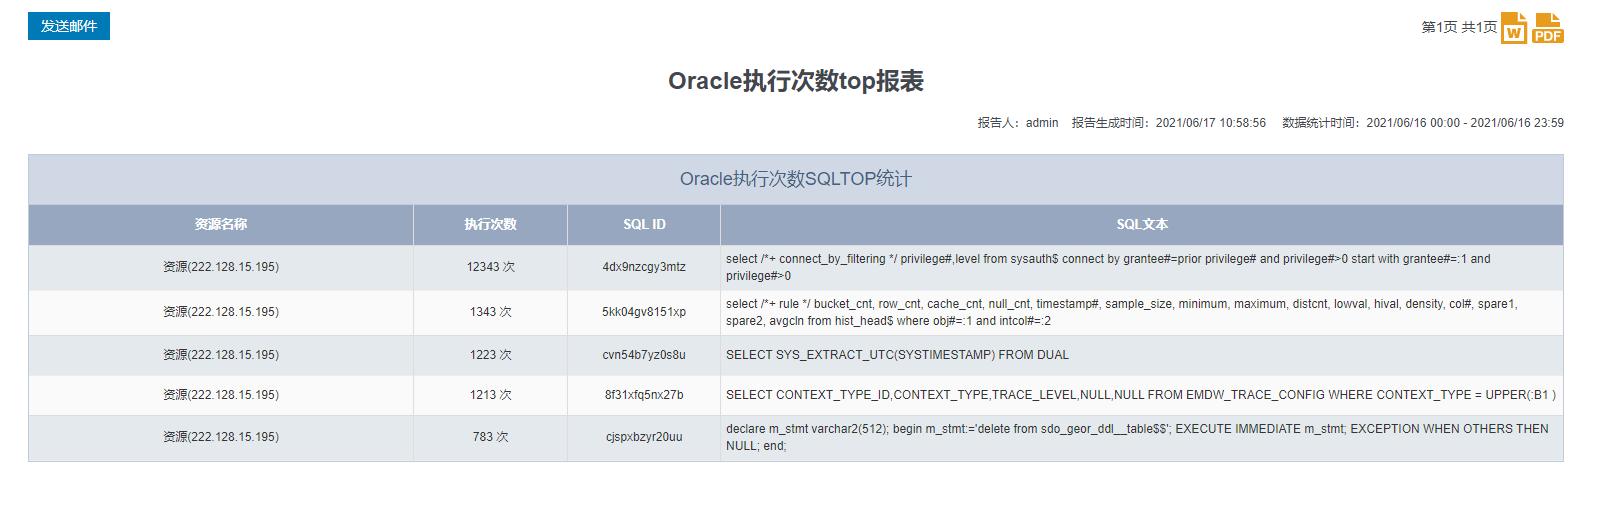 Oracle执行次数top报表